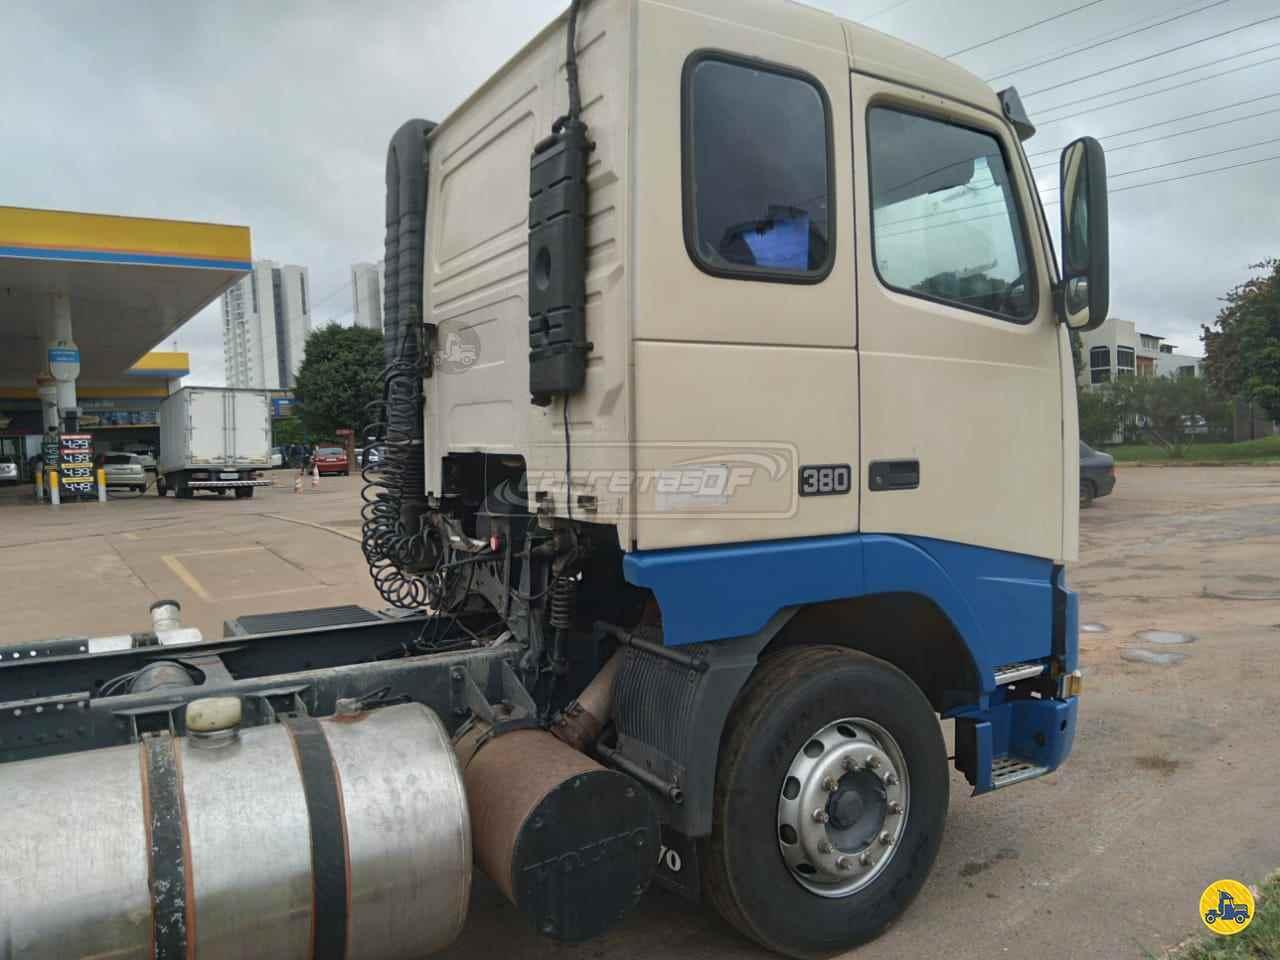 CAMINHAO VOLVO VOLVO FH12 380 Cavalo Mecânico Truck 6x2 CARRETAS DF - NOMA BRASILIA DISTRITO FEDERAL DF